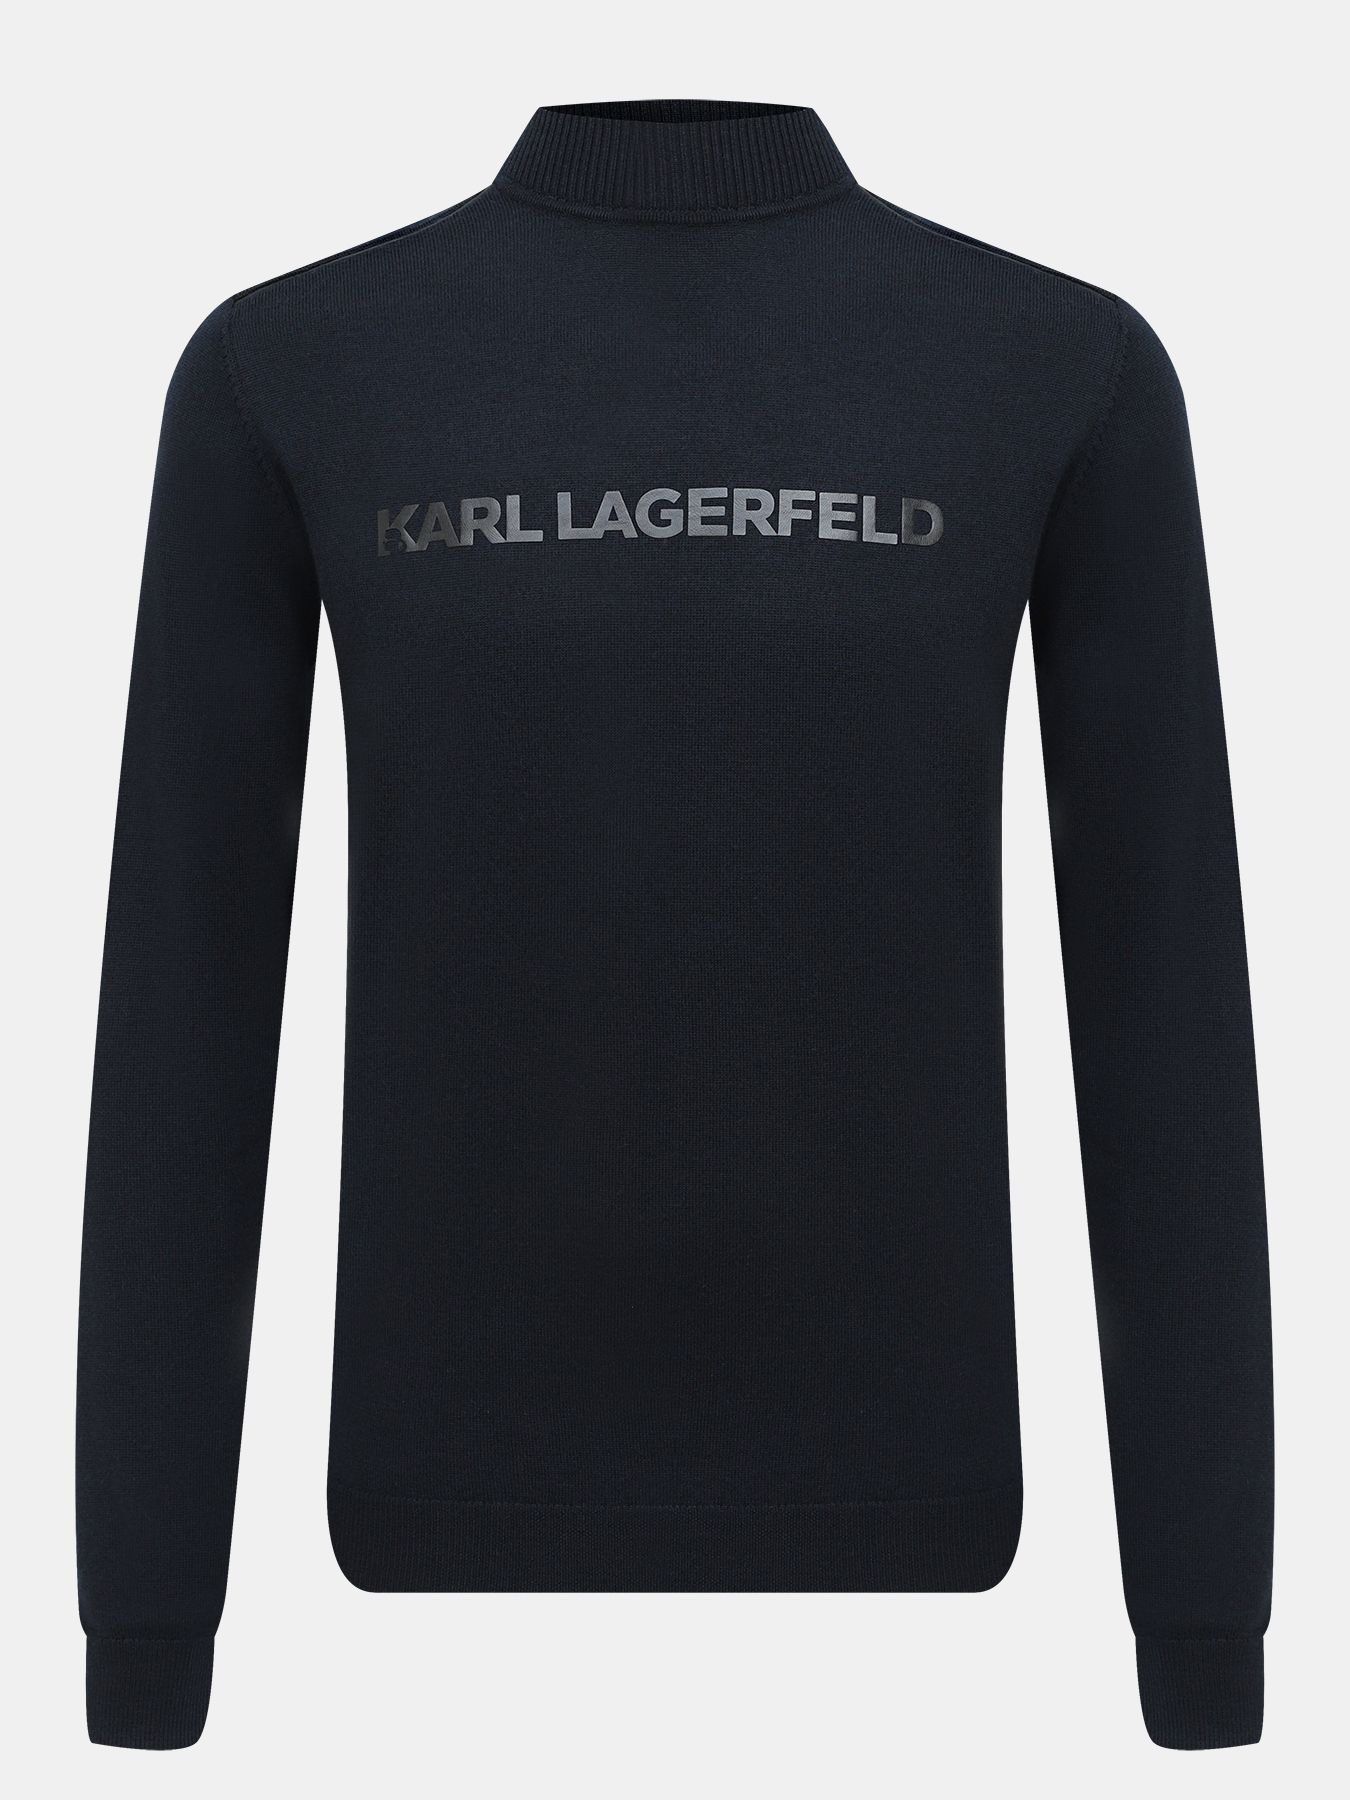 Джемперы Karl Lagerfeld Джемпер толстовка karl lagerfeld мужской джемпер